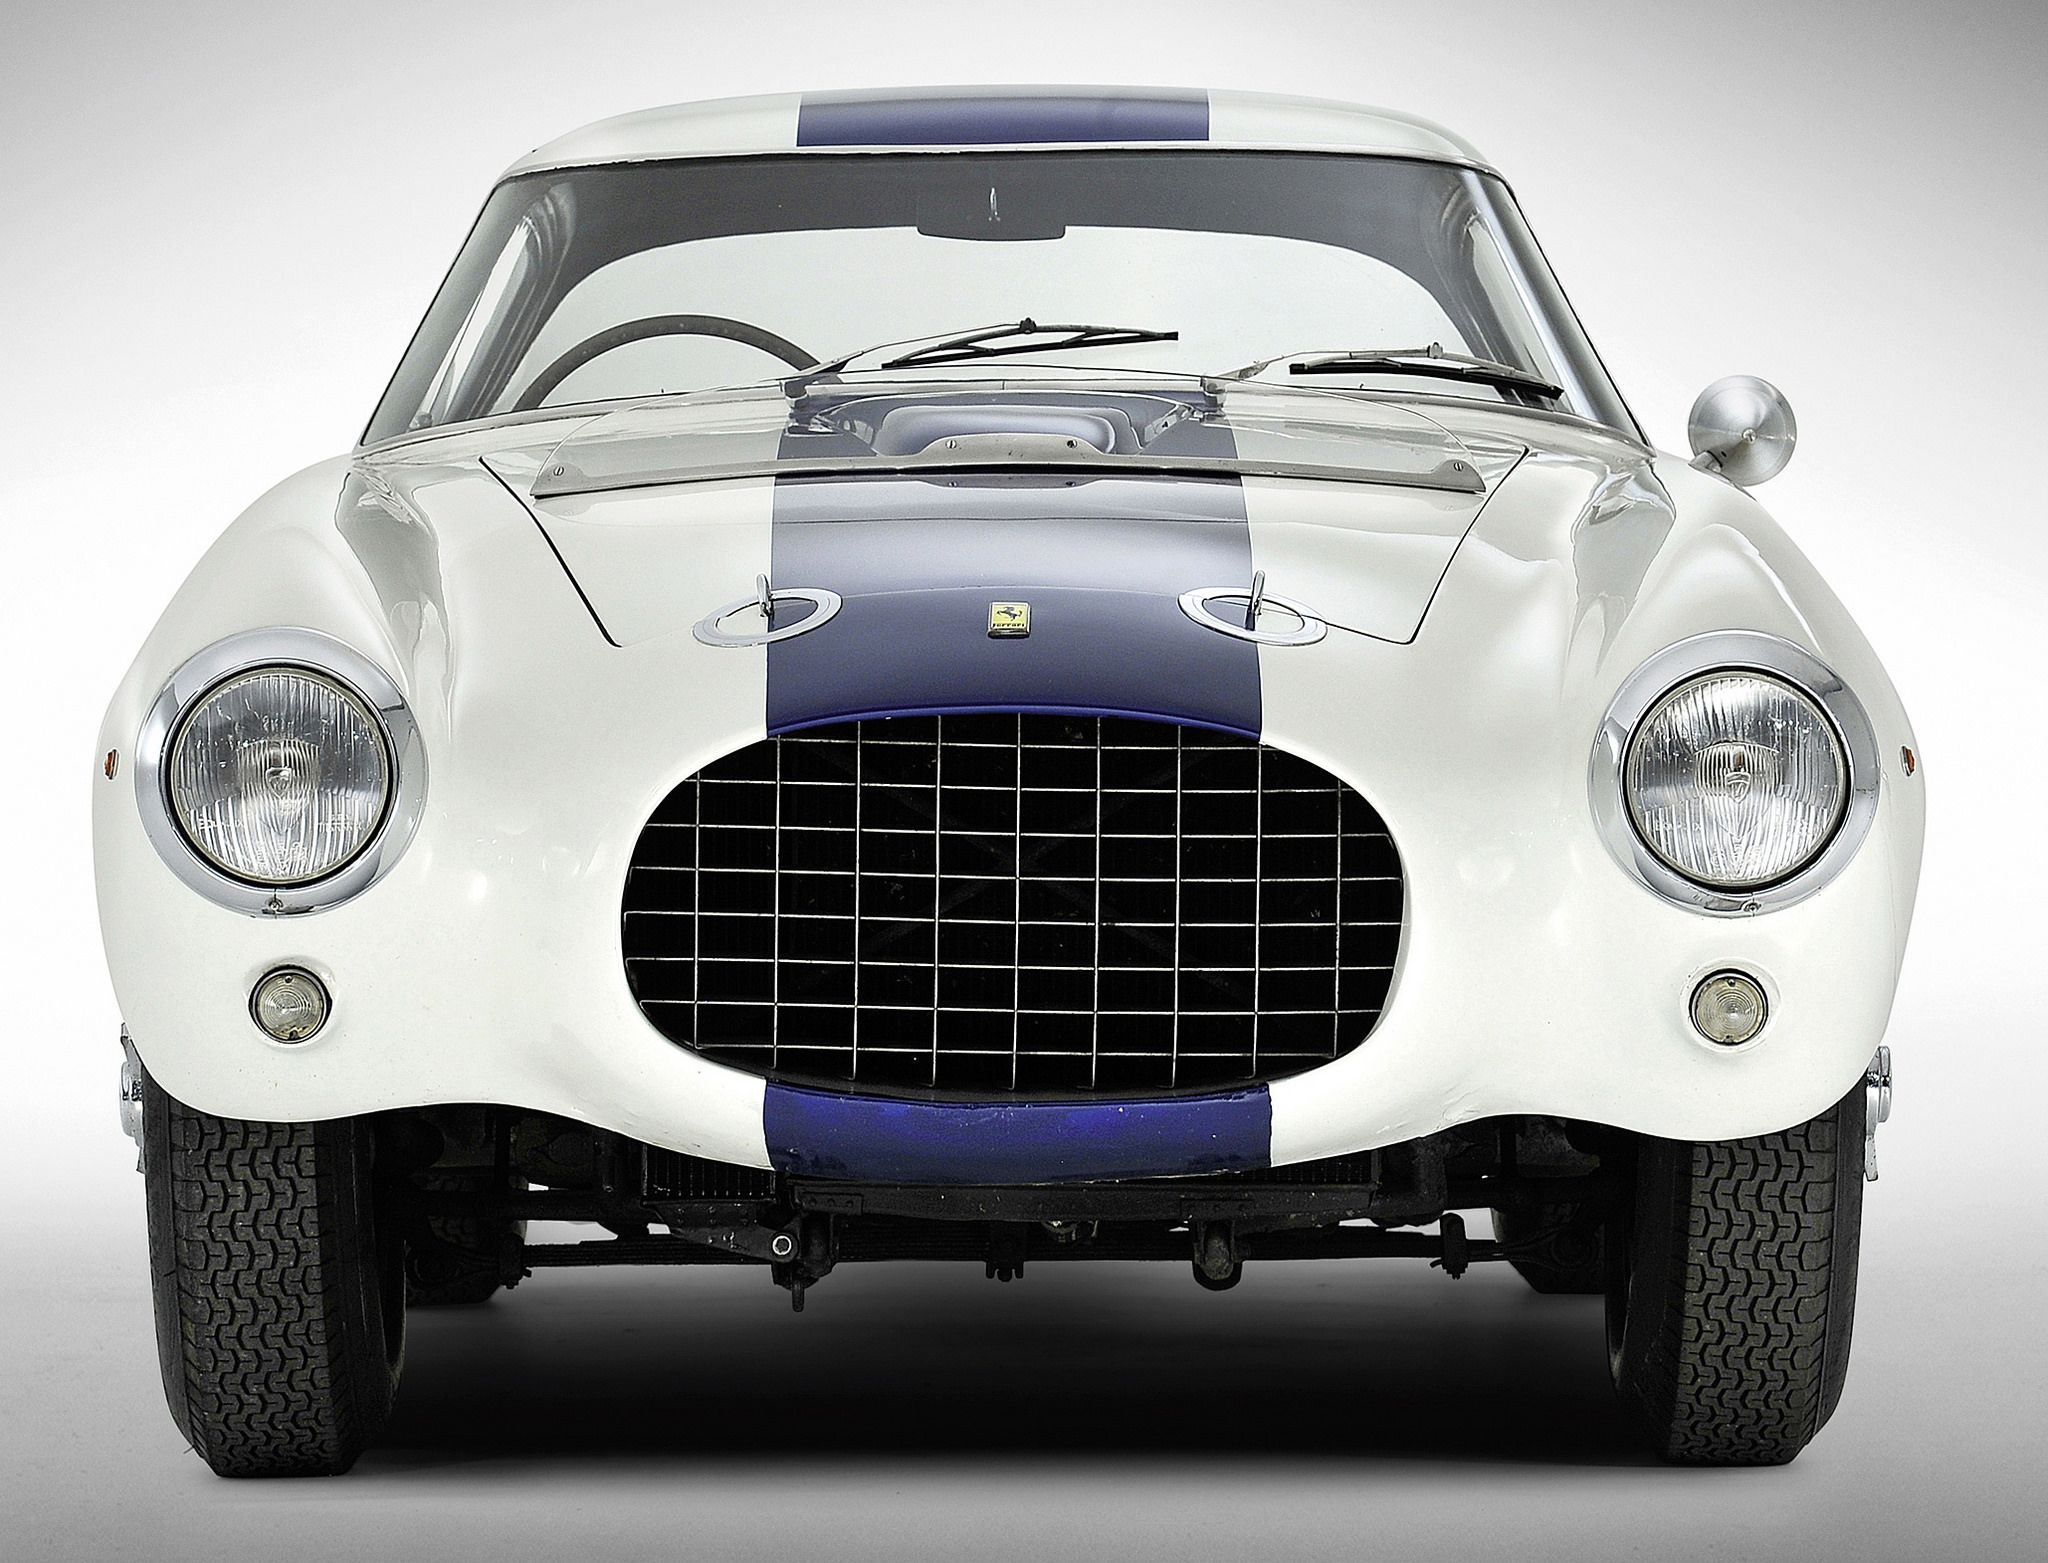 1953 Ferrari 250 Mm Berlinetta With Images Best Luxury Cars Cars Ferrari